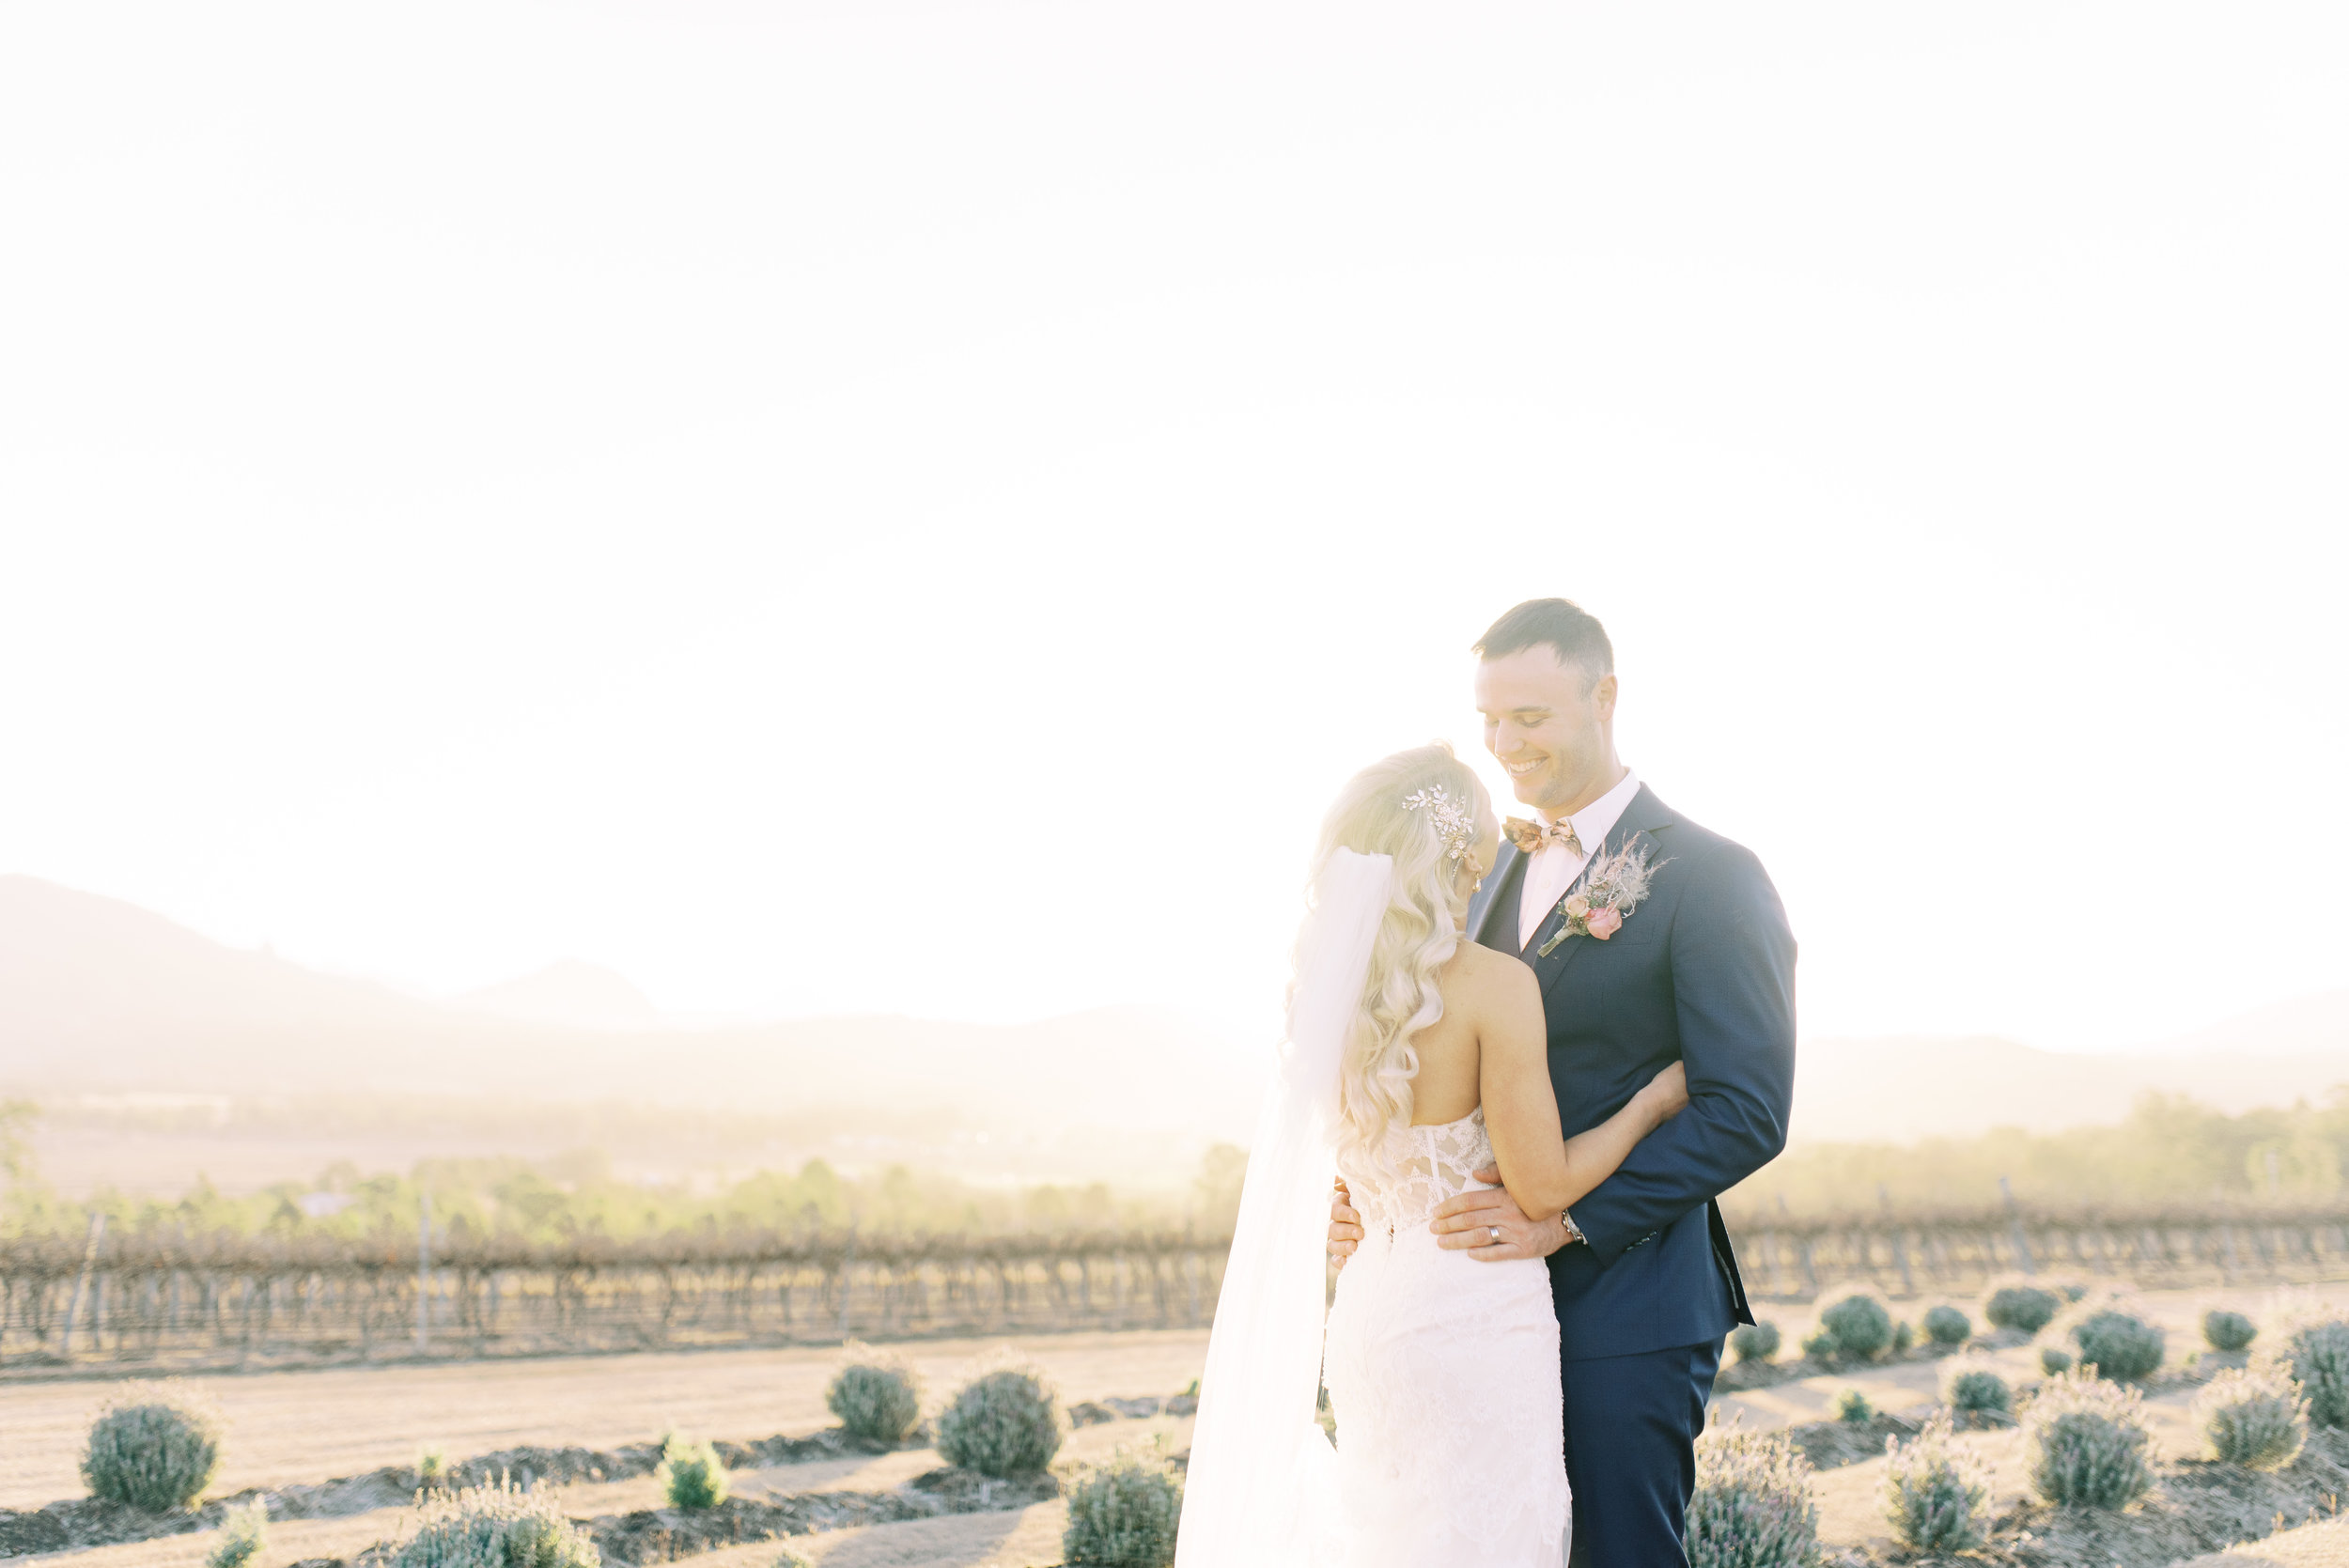 Kooroomba-Vineyard-Lavender-Farm-Wedding-Fine-Art-Lauren-Olivia-66.jpg